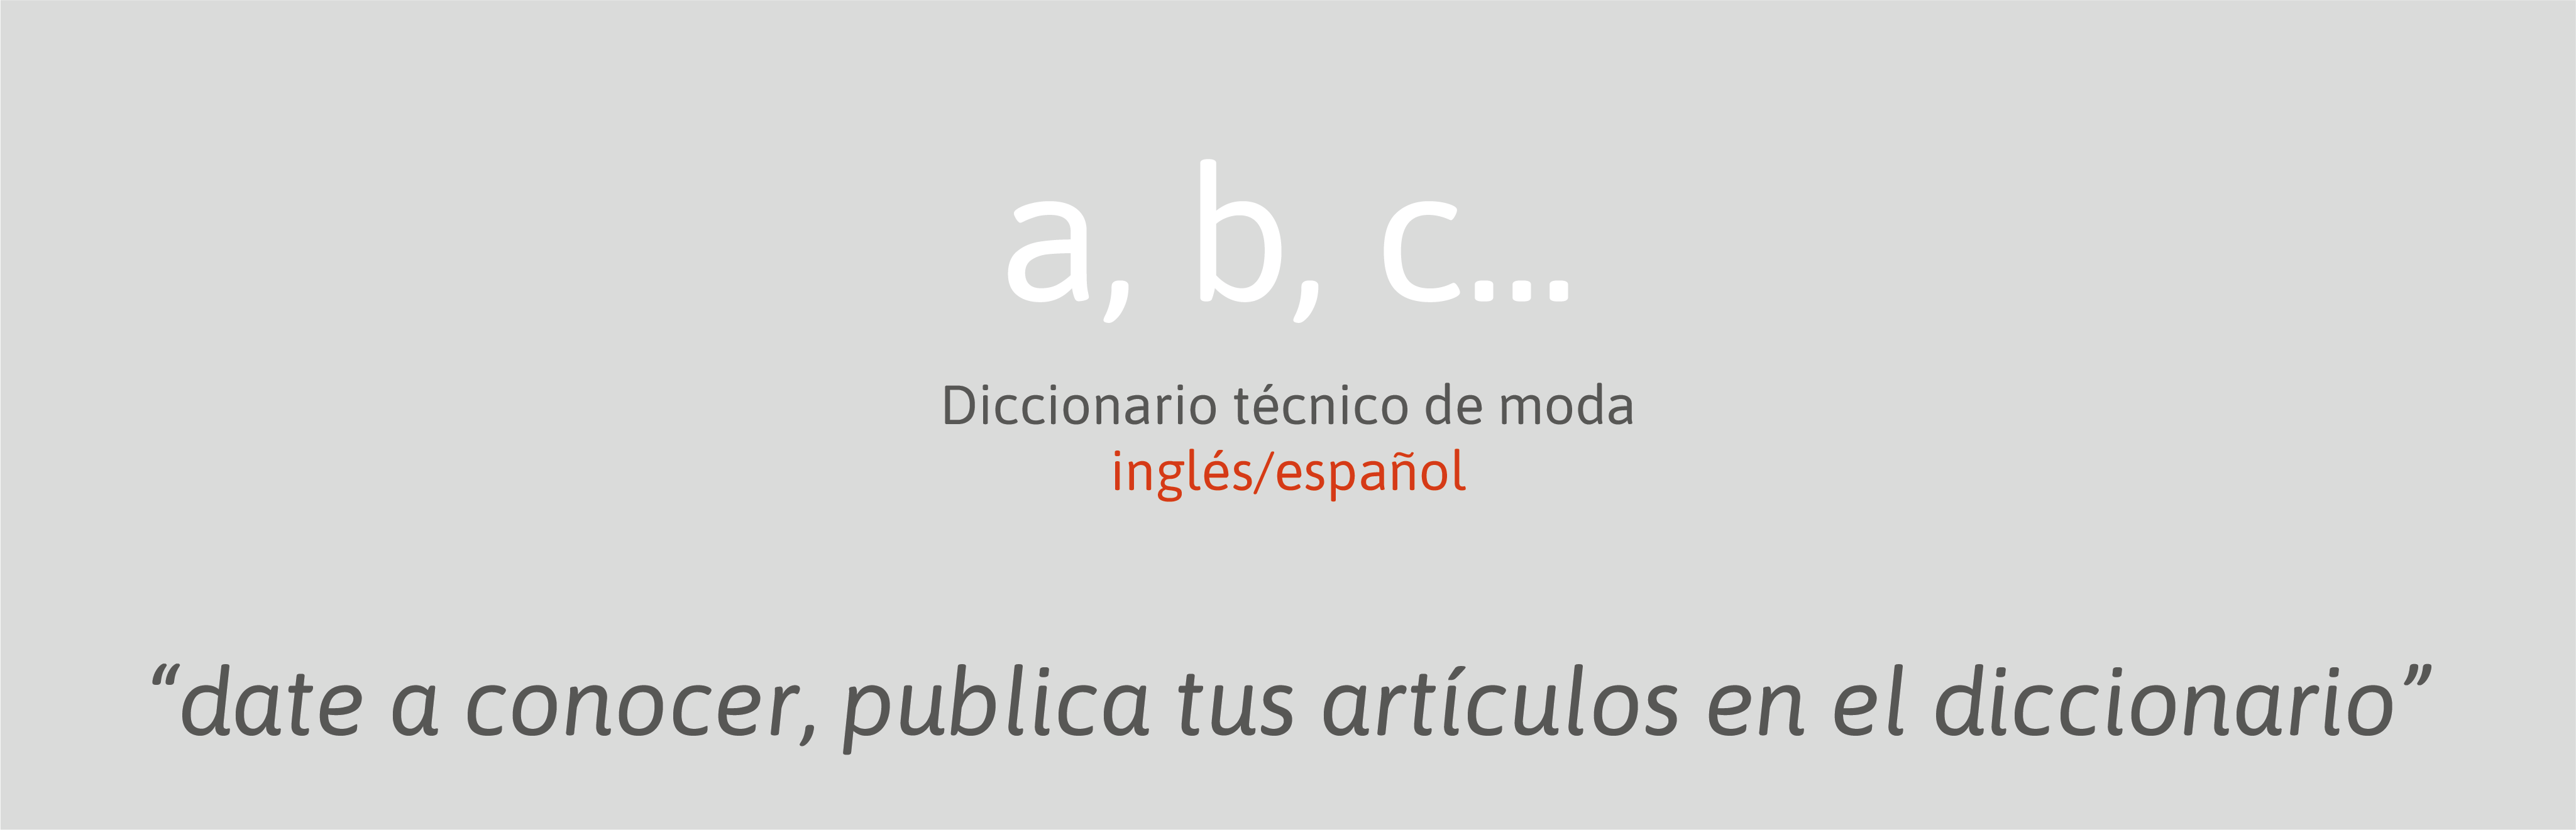 diccionario moda seampedia